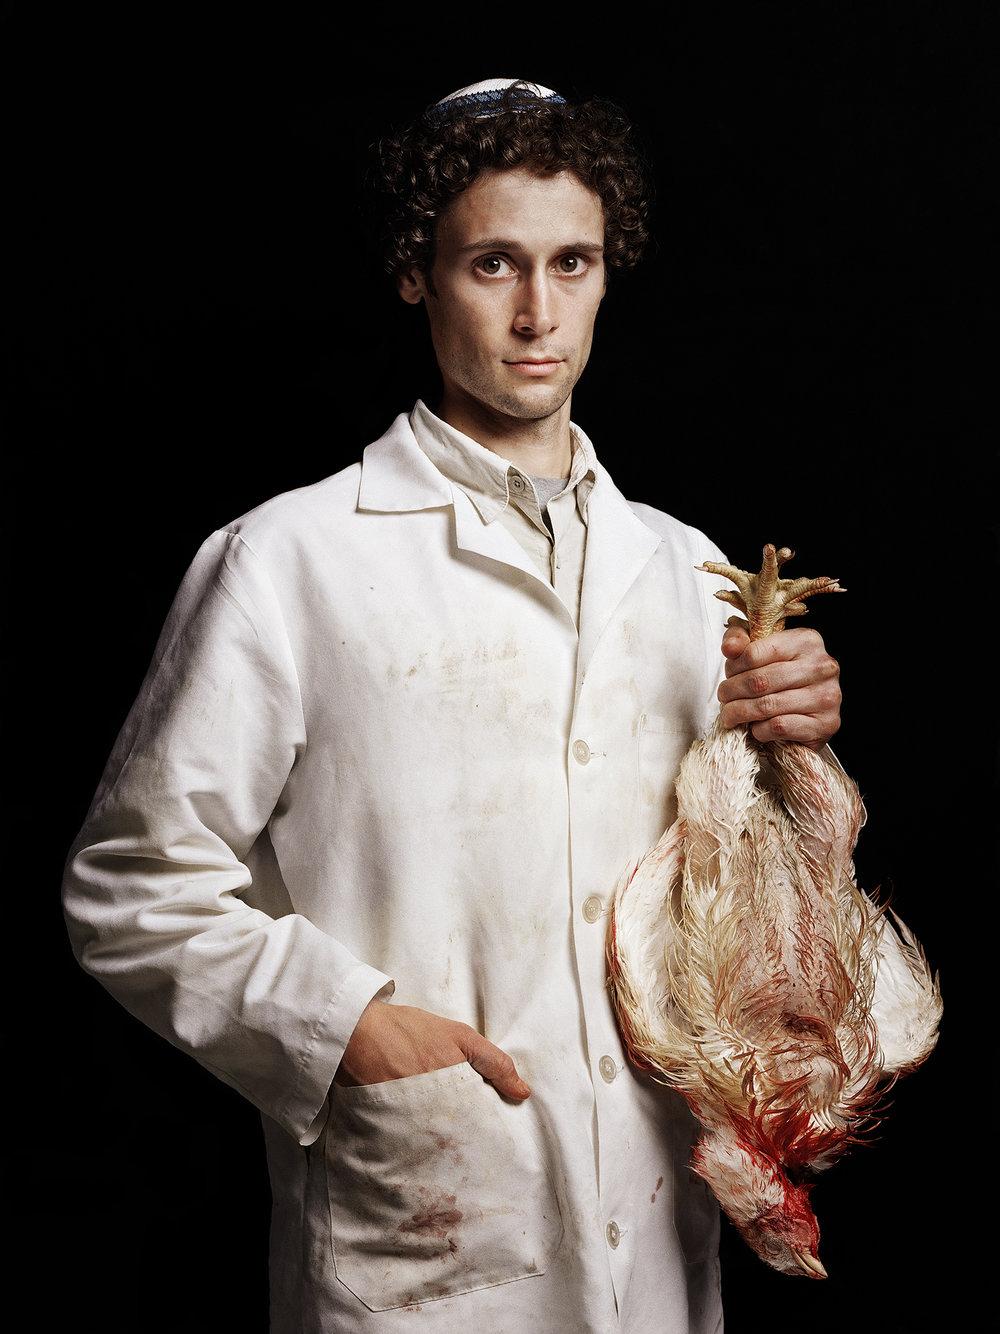 Andy Kastner, Kosher Butcher - New York City